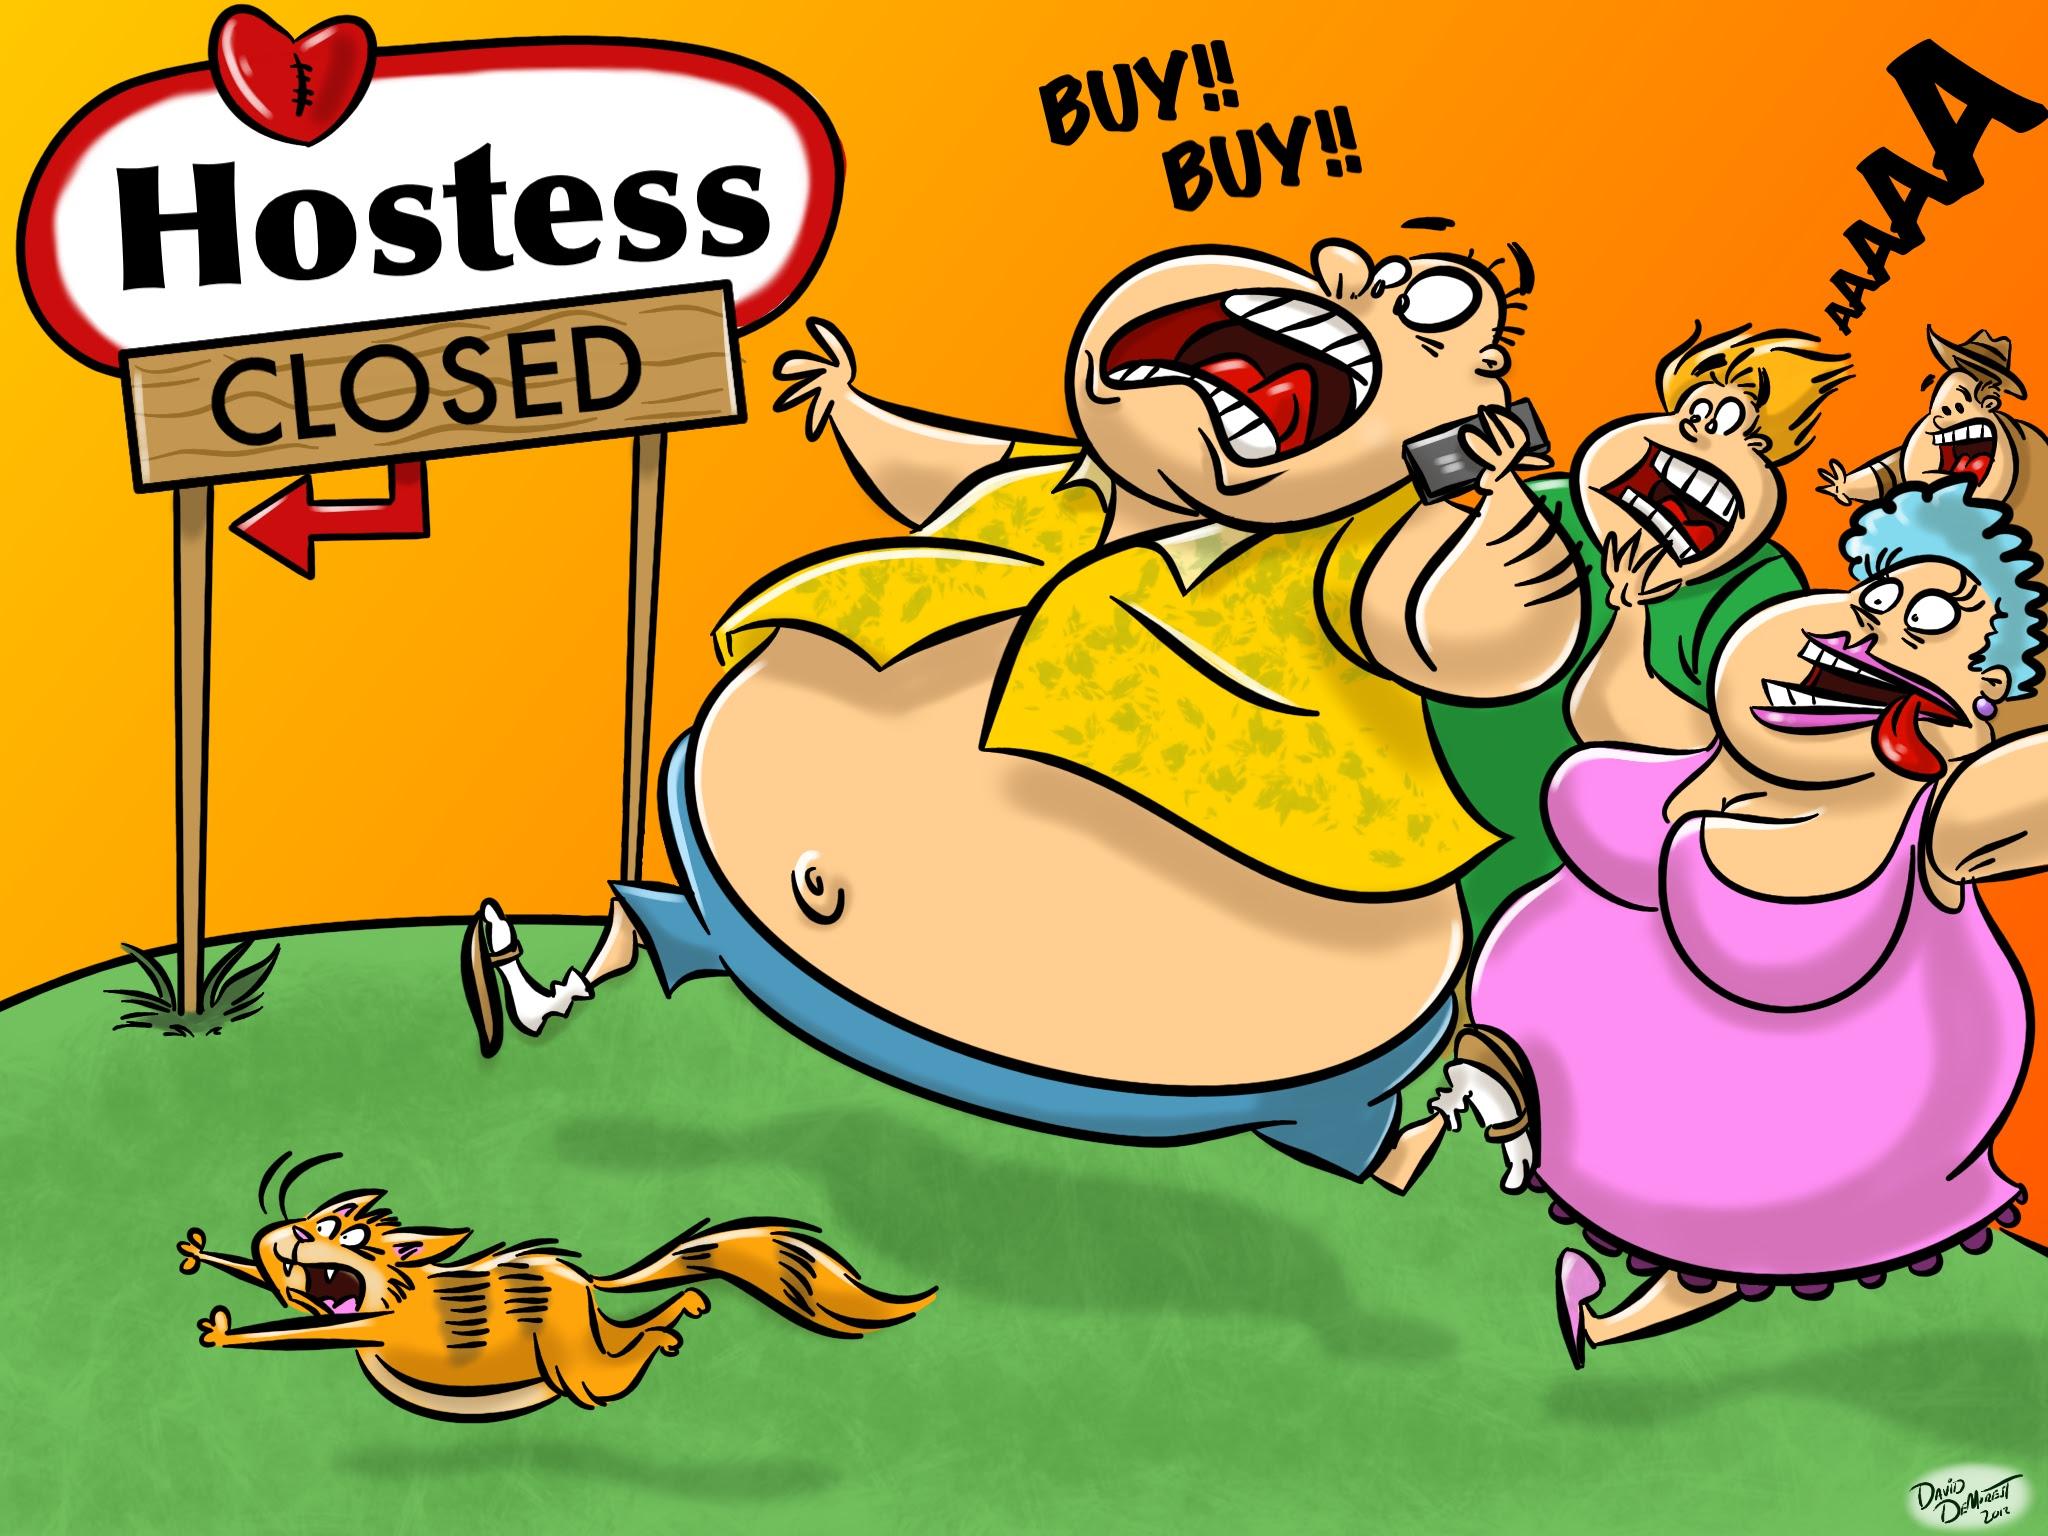 hostessTwinkies.jpg